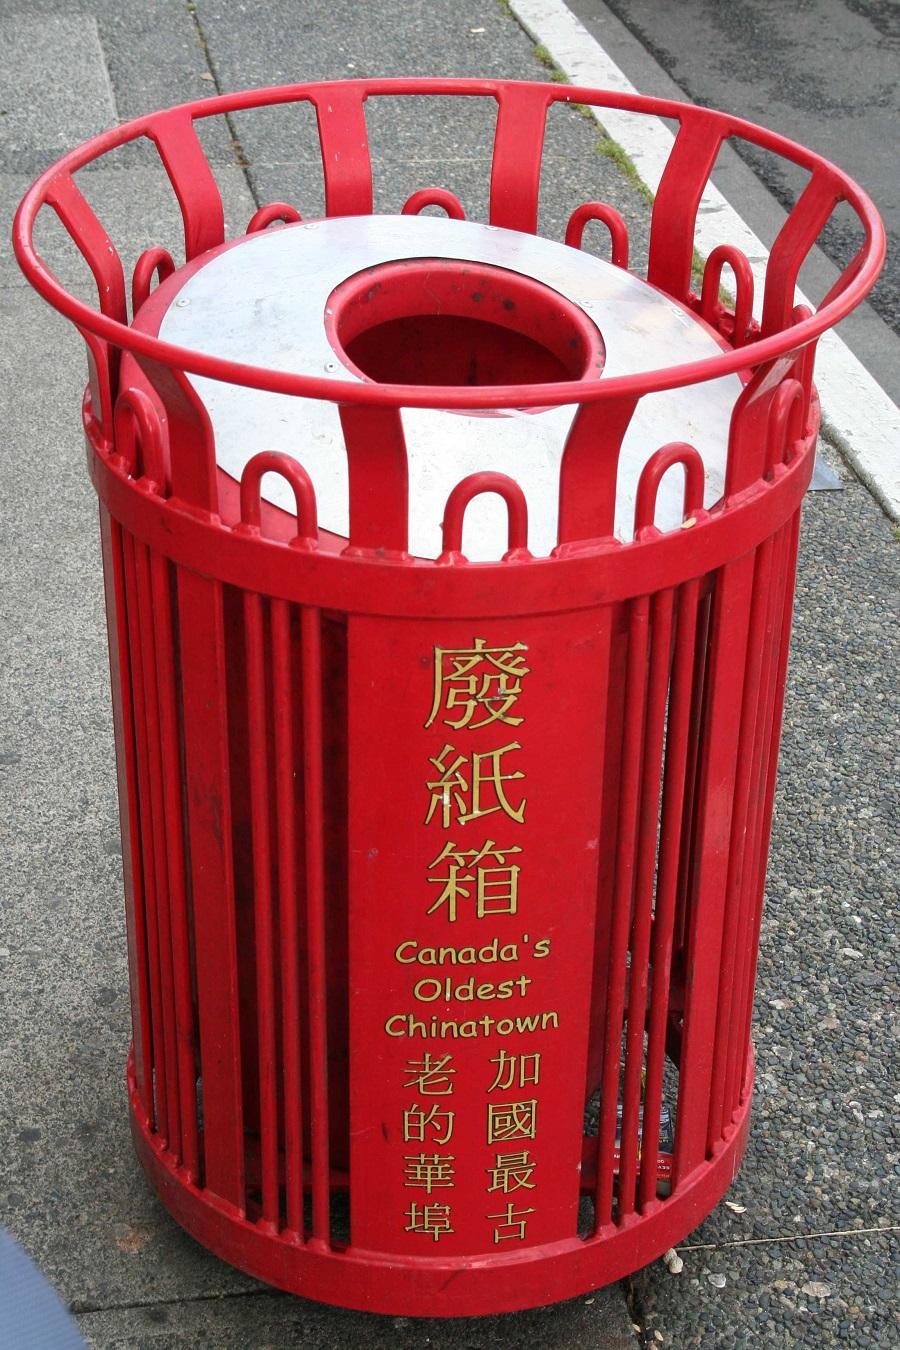 Chinatown_Victoria (9).JPG